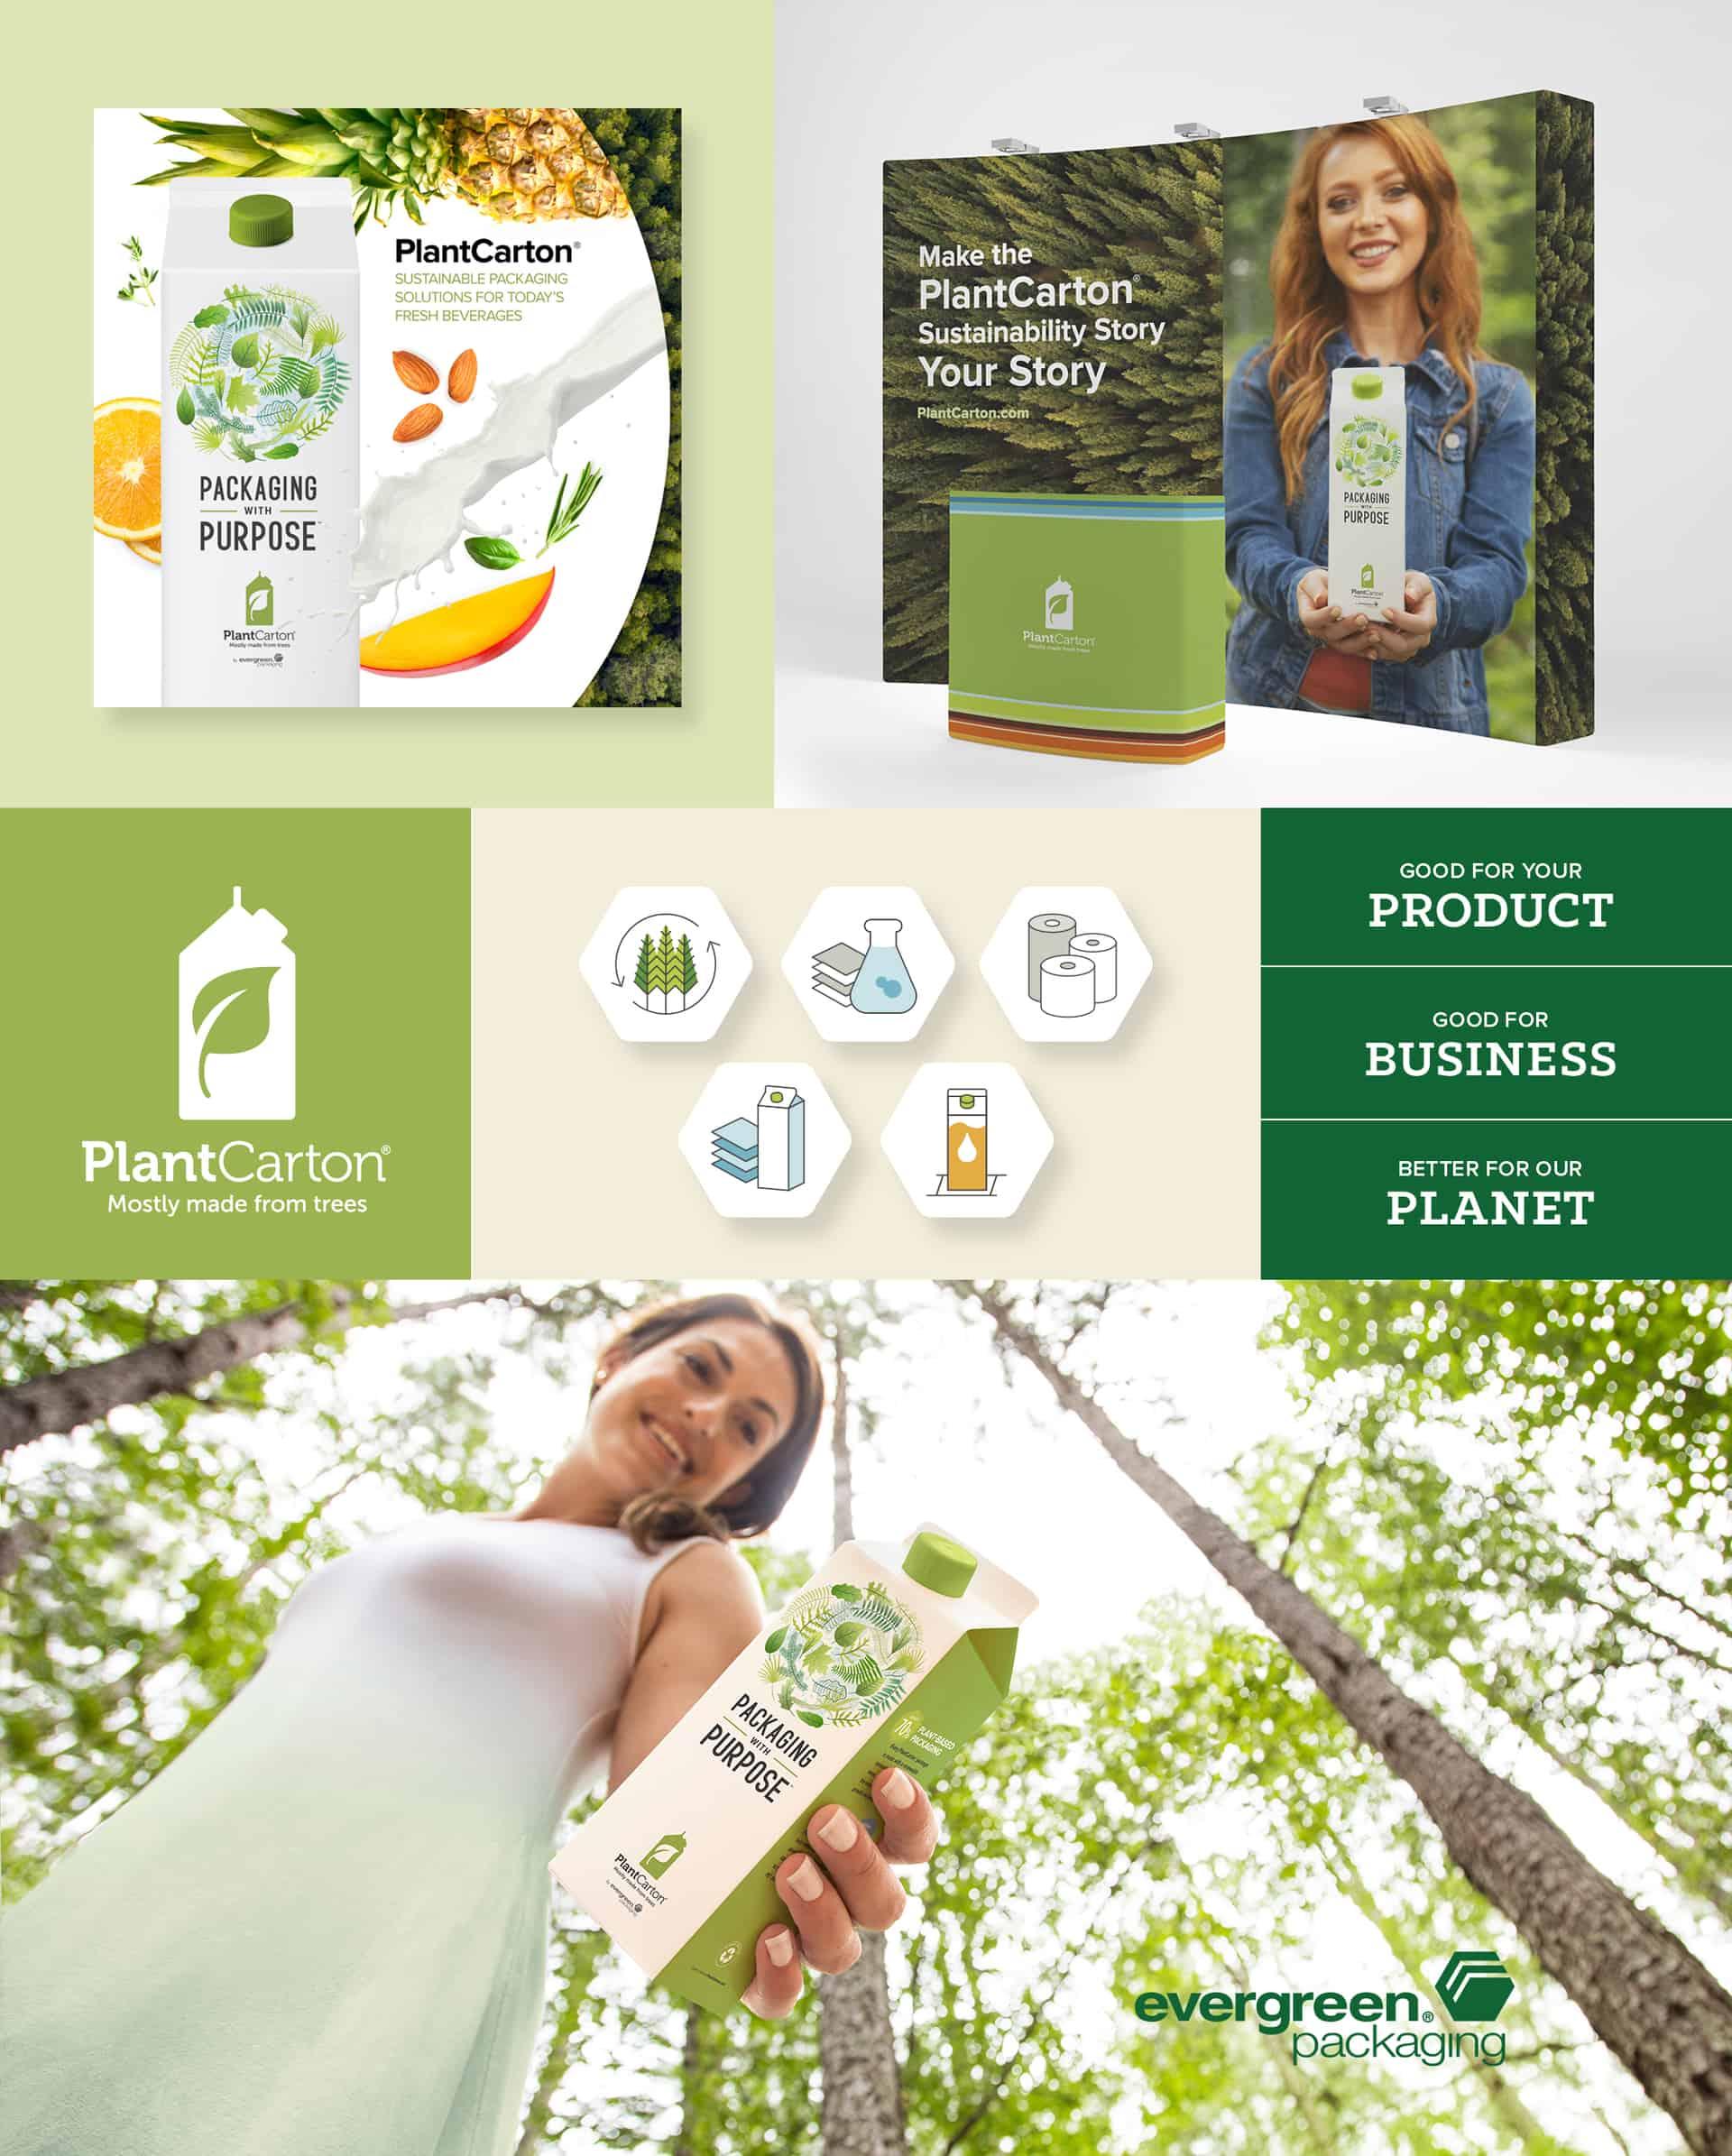 plantcarton brand